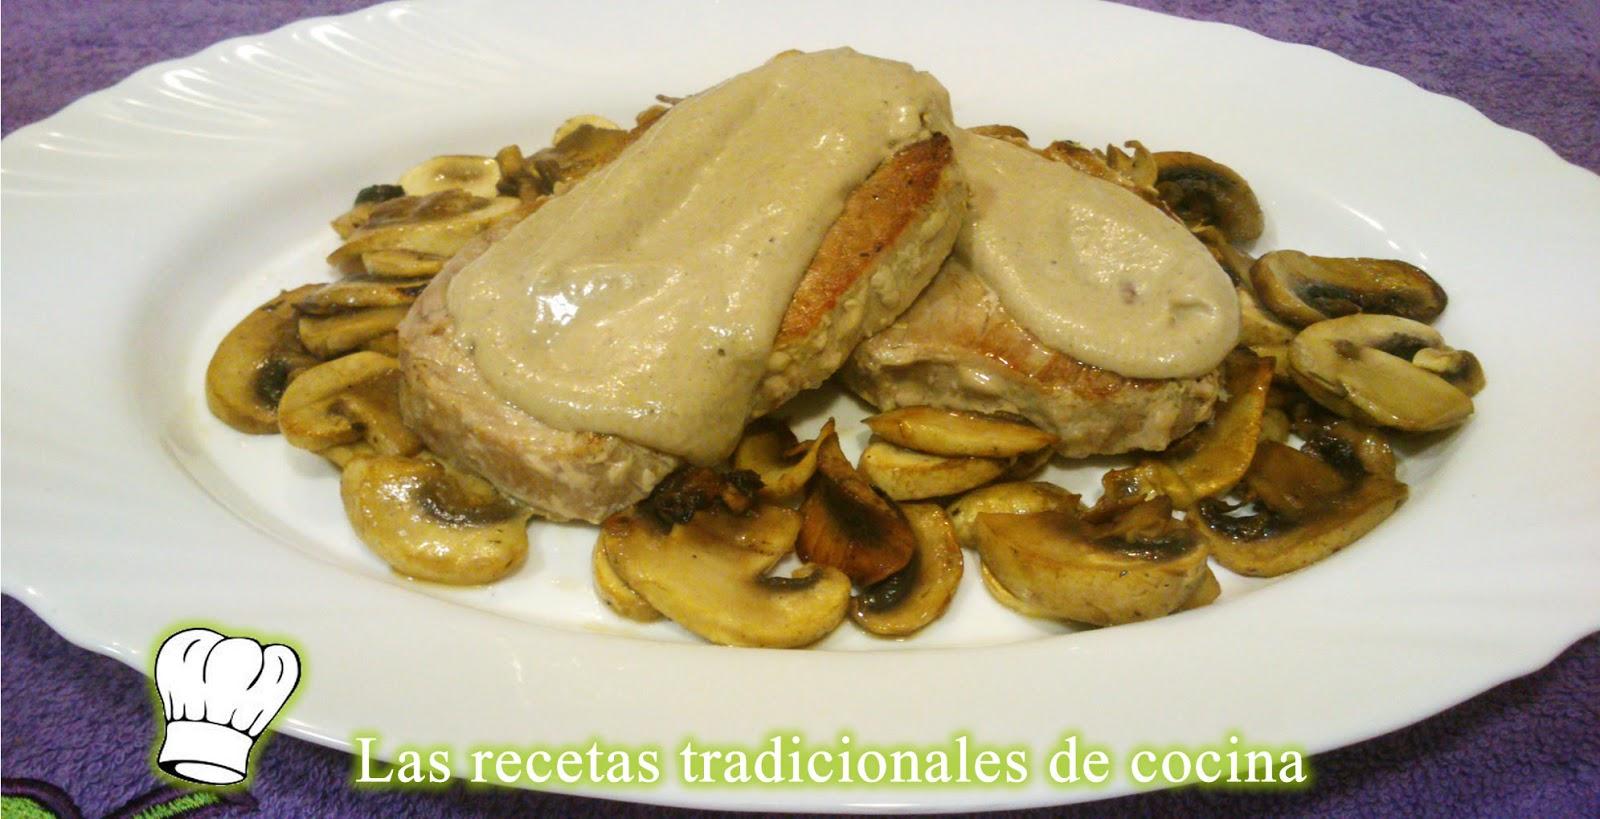 Recetas De Cocina Con Sabor Tradicional Receta De Atún